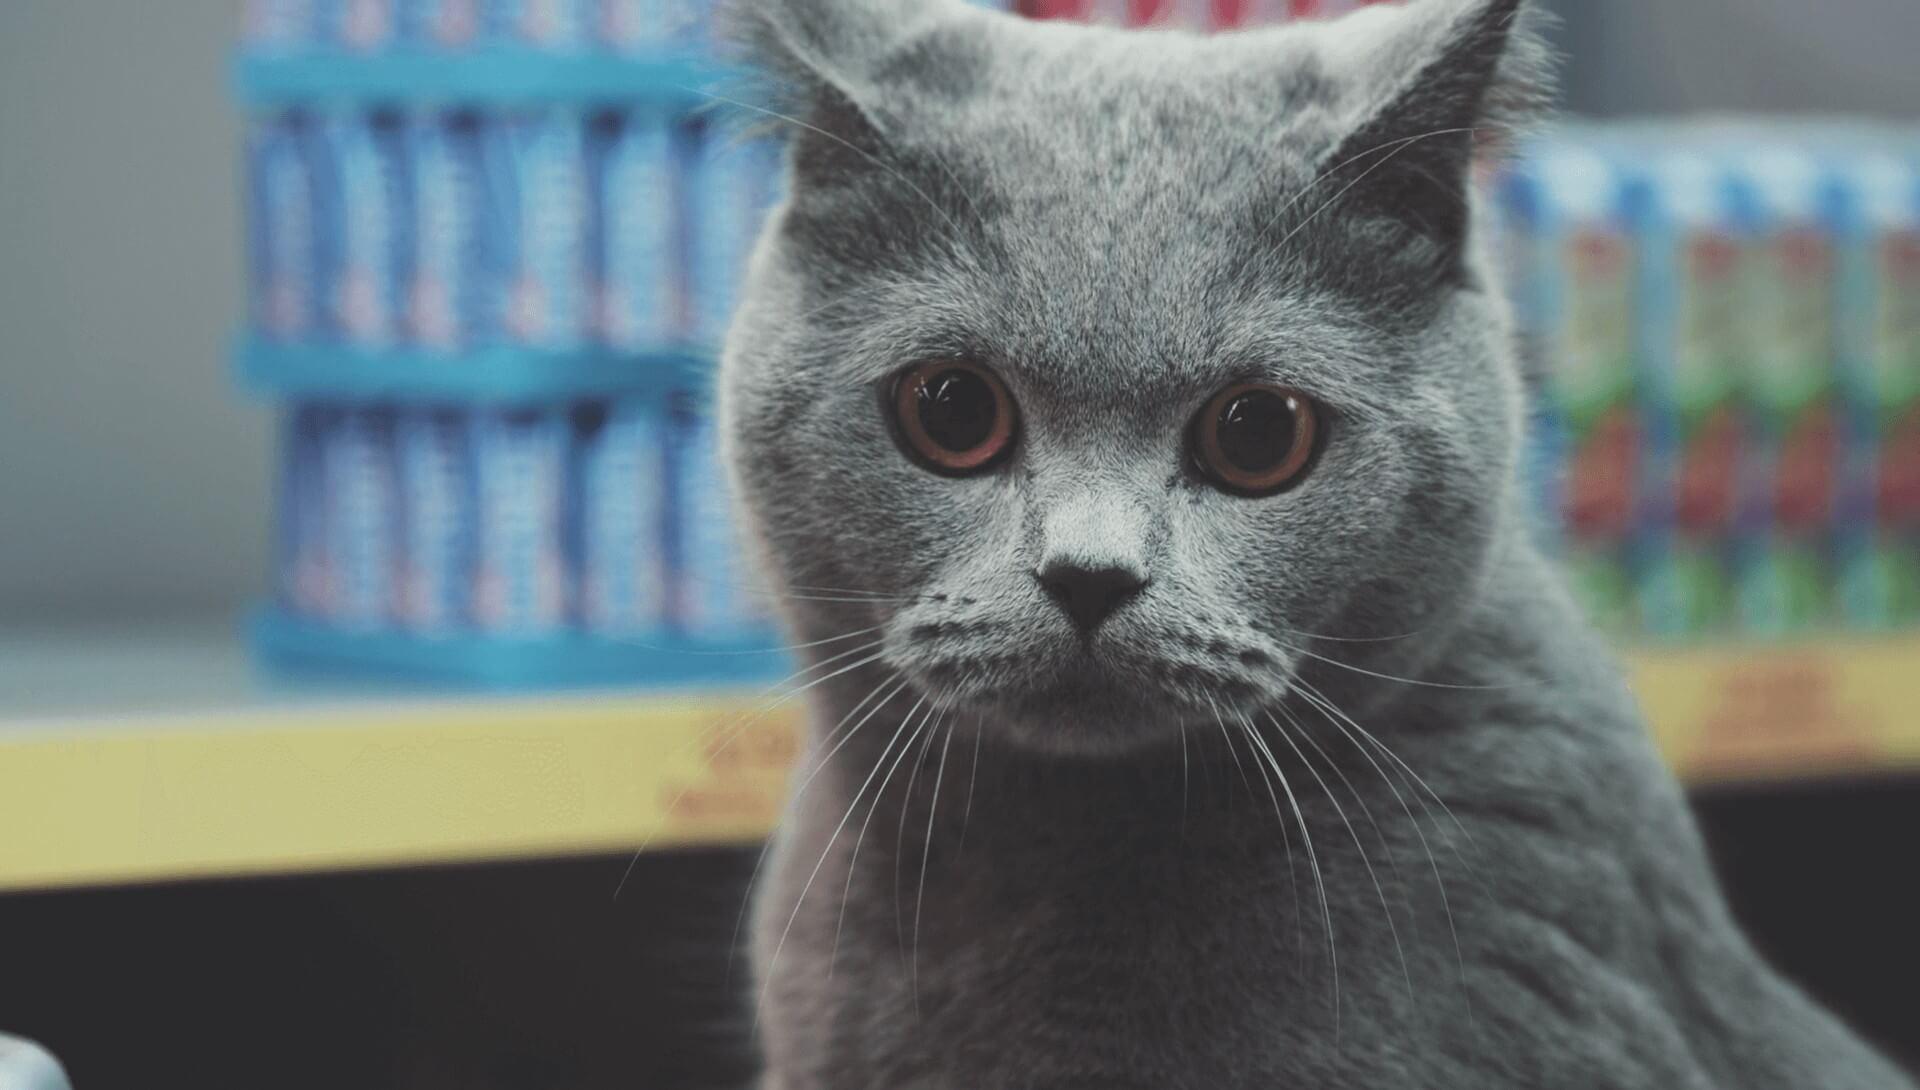 NETTO - Cats